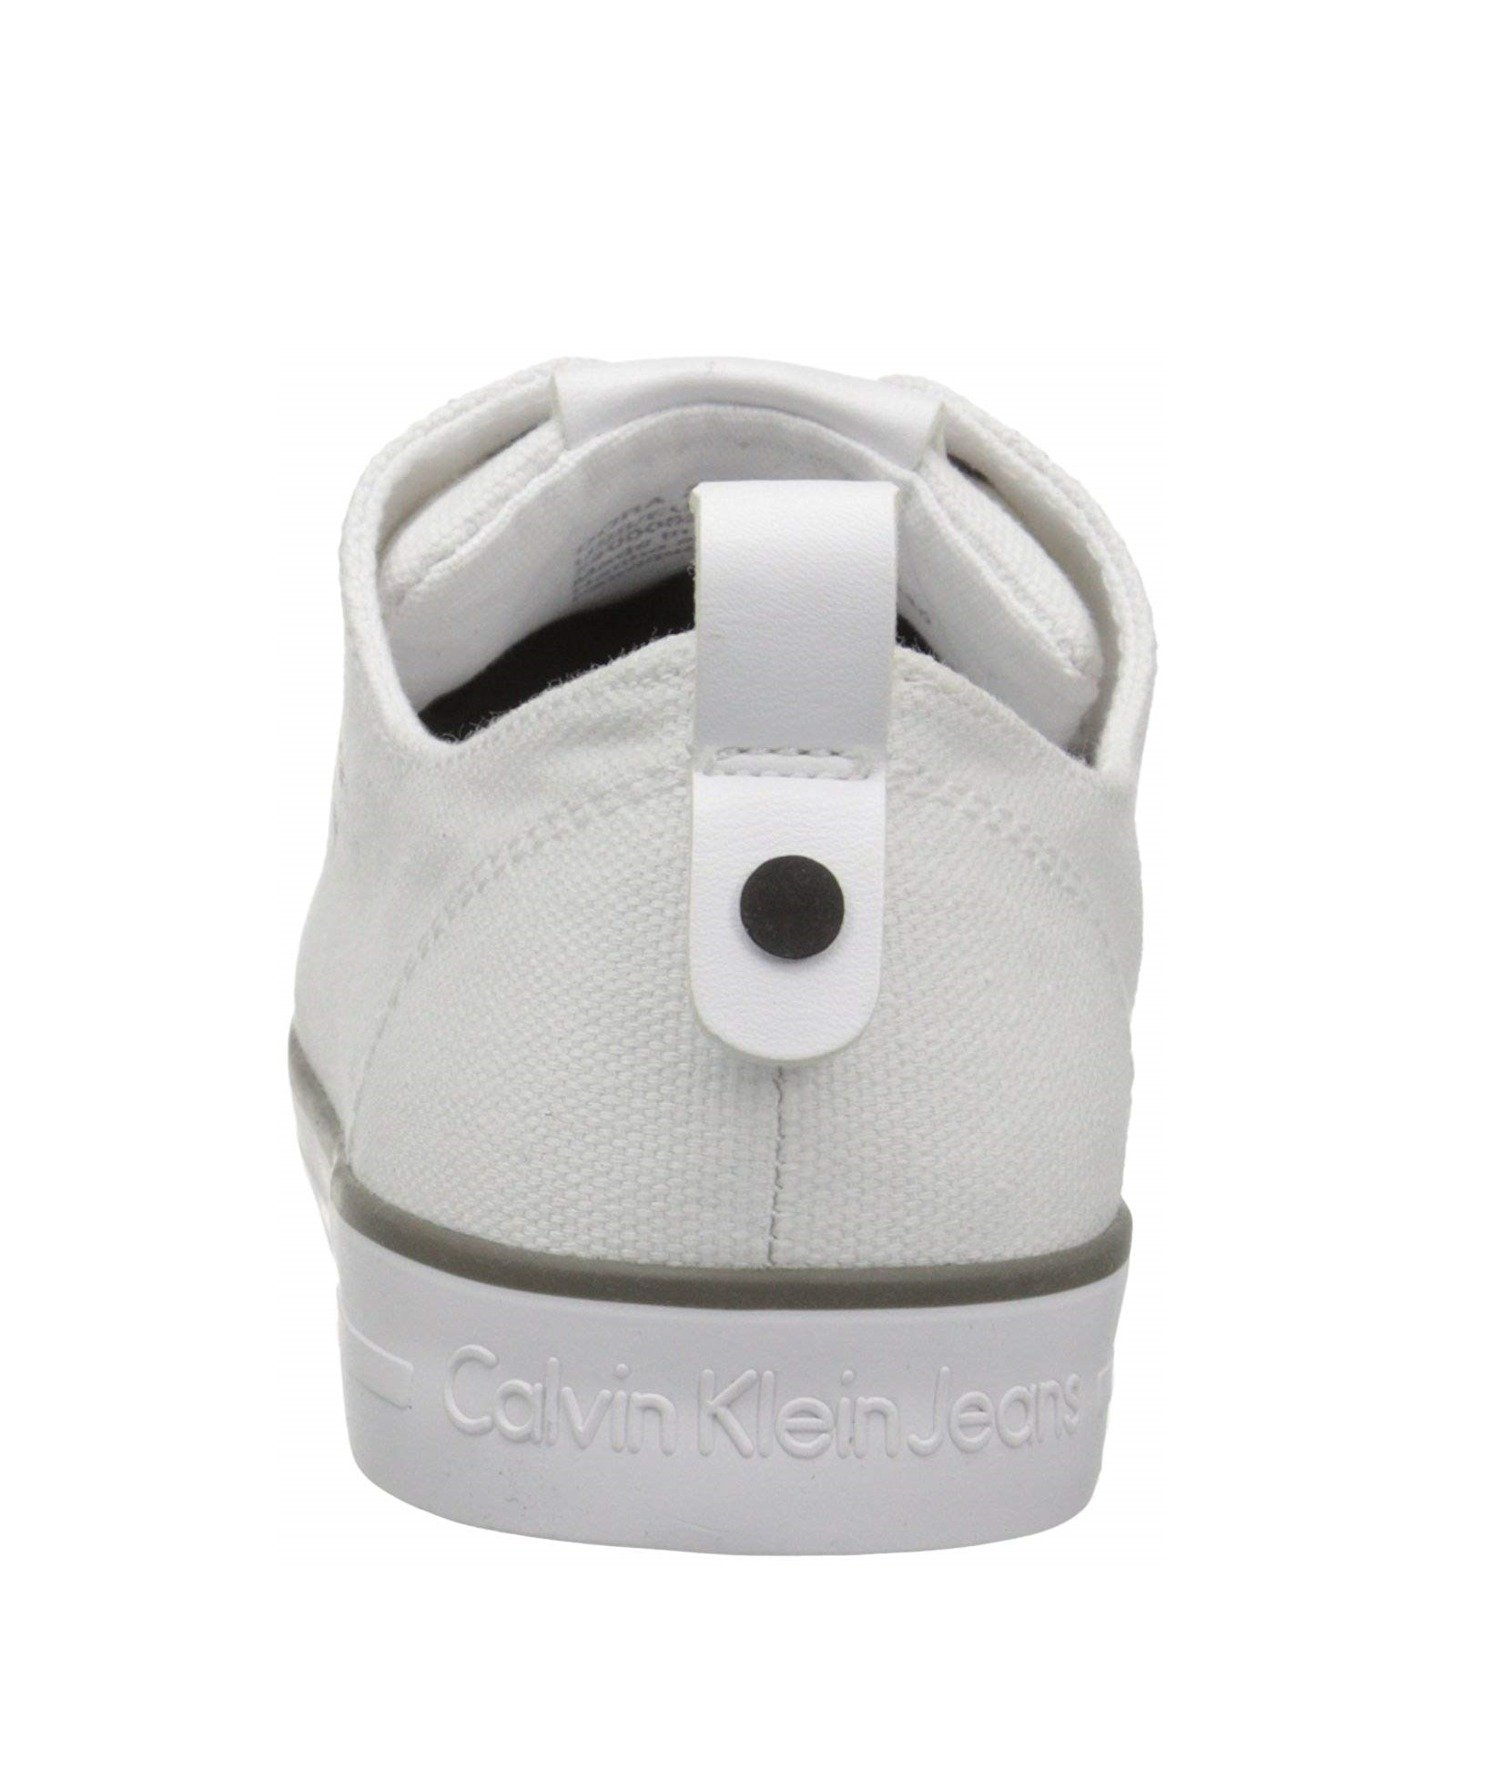 CALVIN KLEIN JEANS Dora Damen Women Sneaker Schuhe Shoes Weiß White